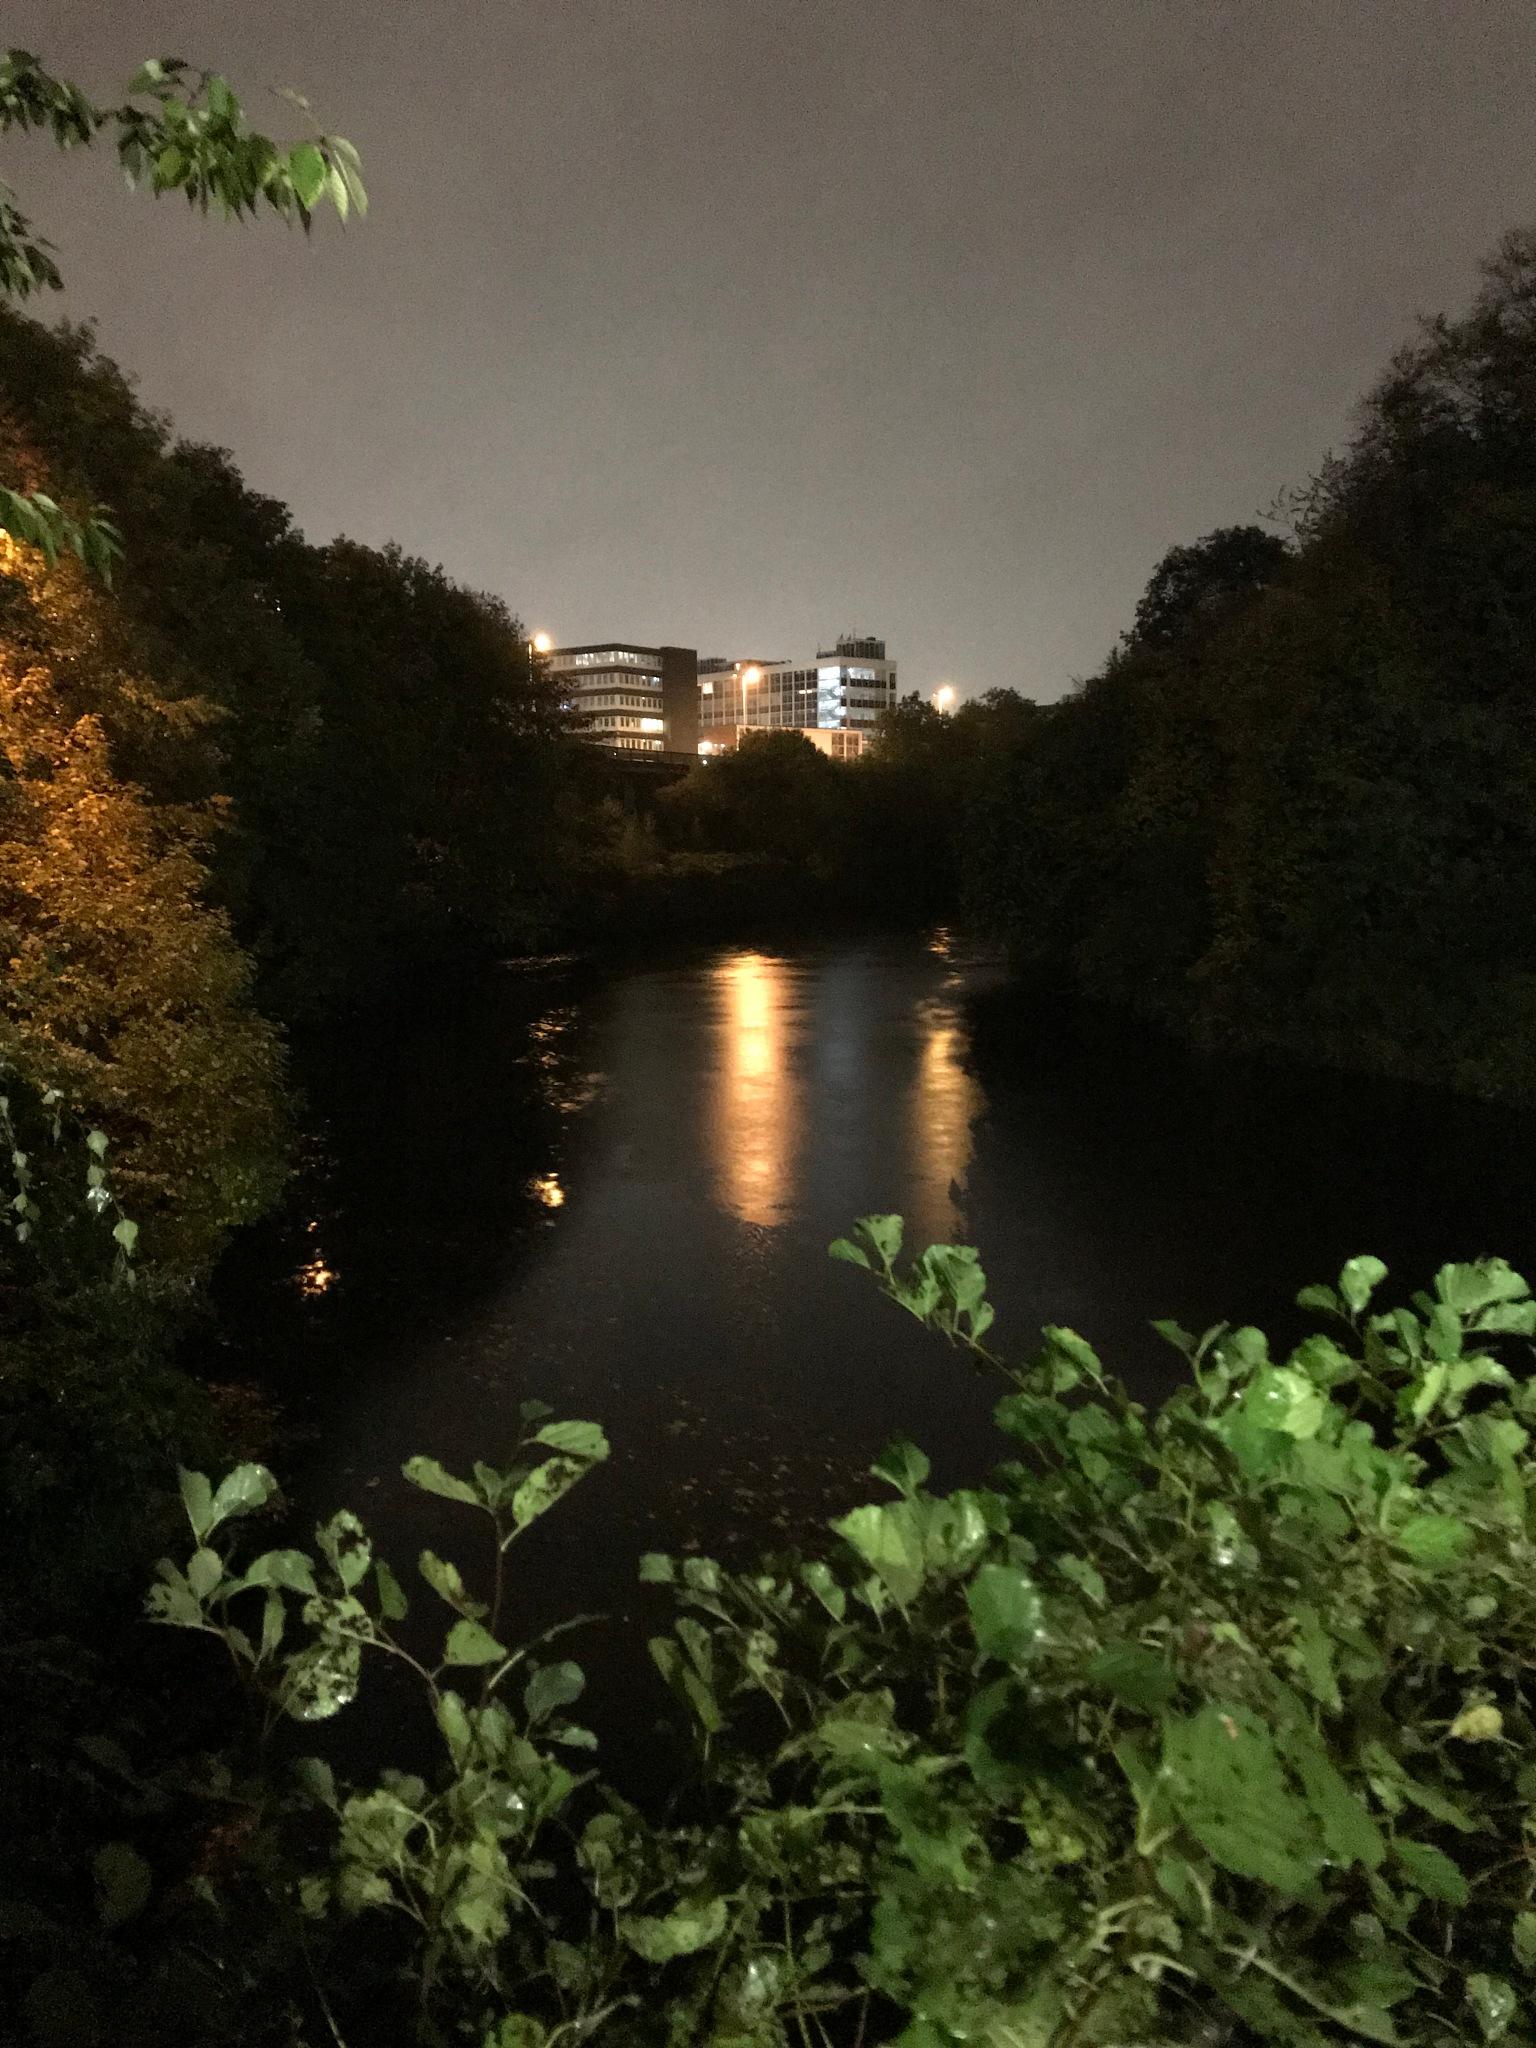 River by Vincenzo Puccio